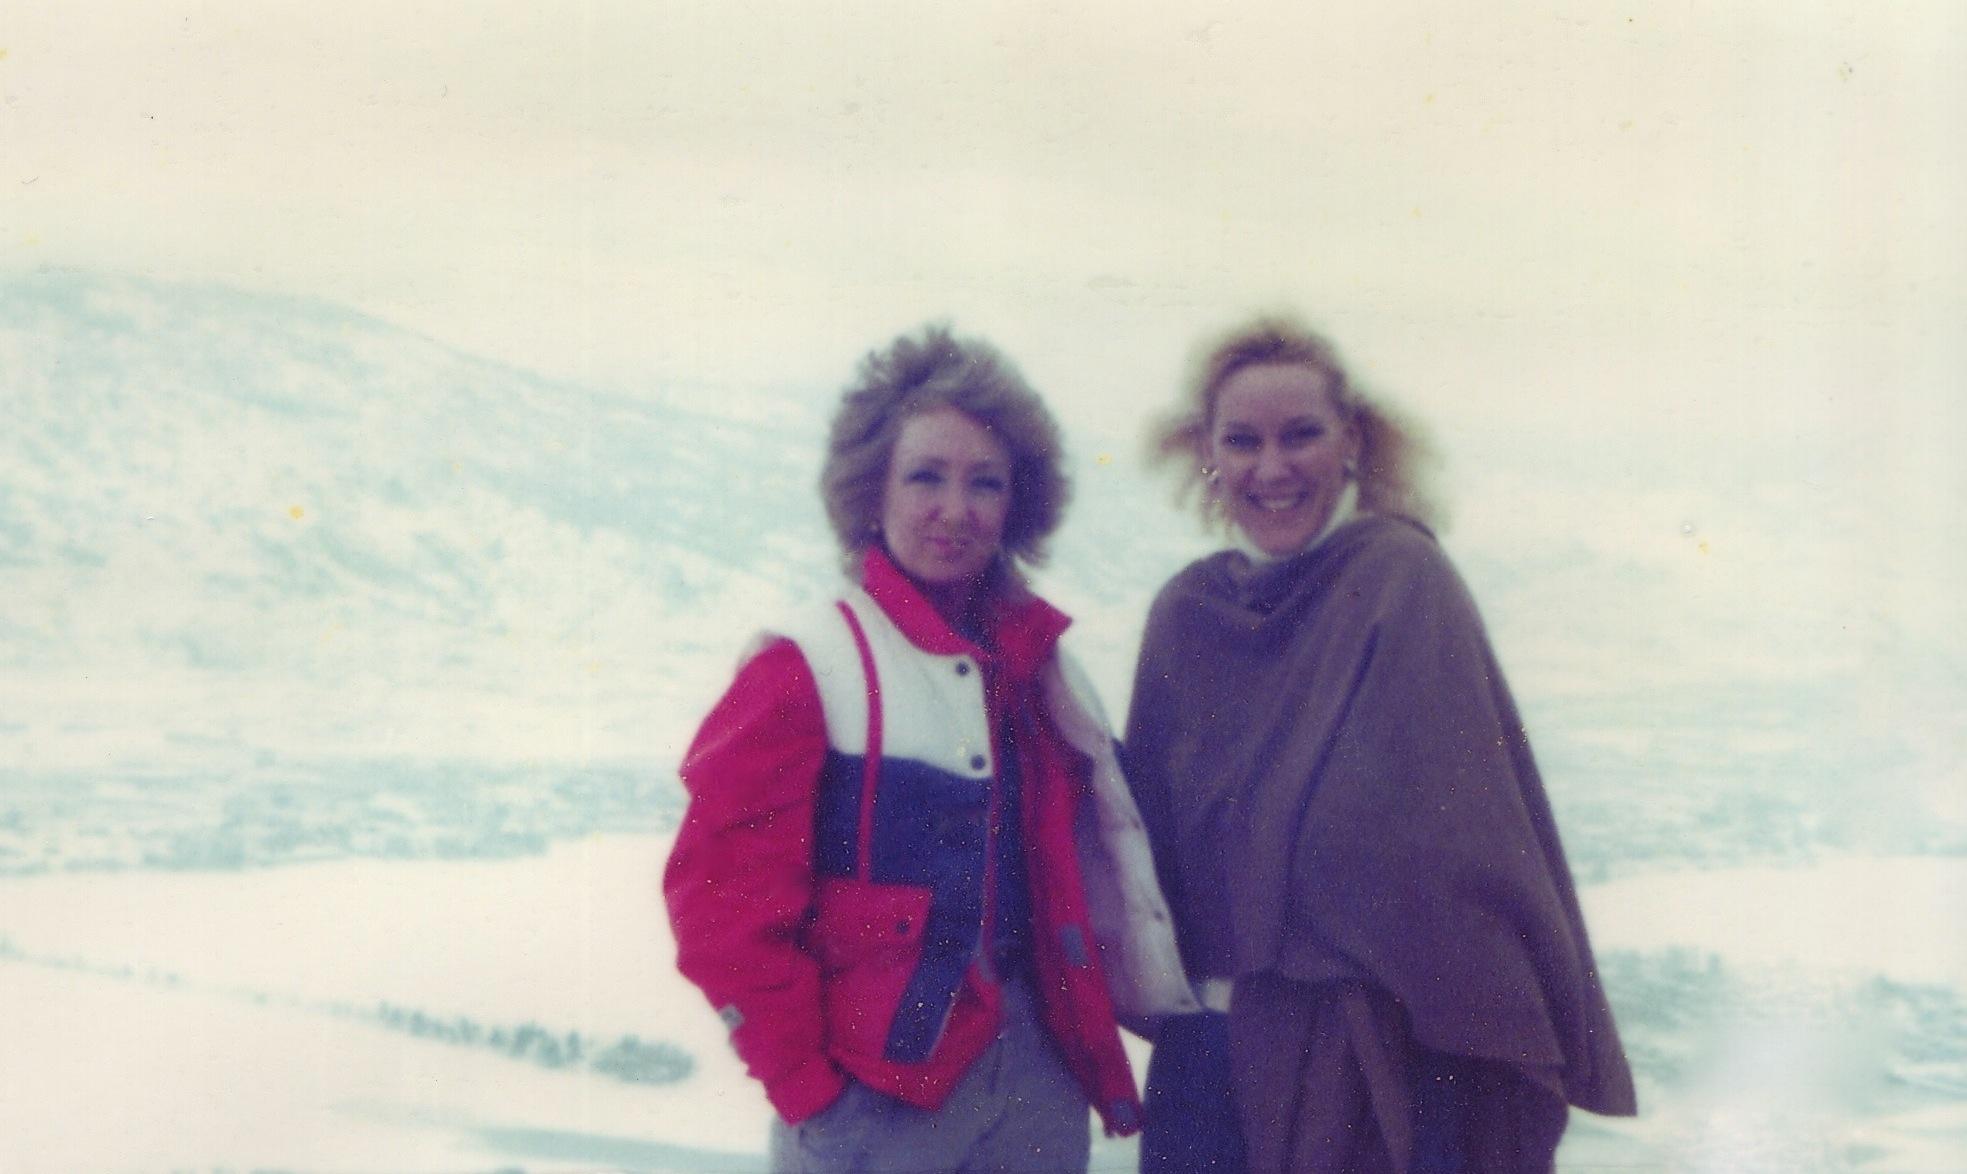 Lynn Van Dove and Valerie Silk on Richter Pass, January 1986.